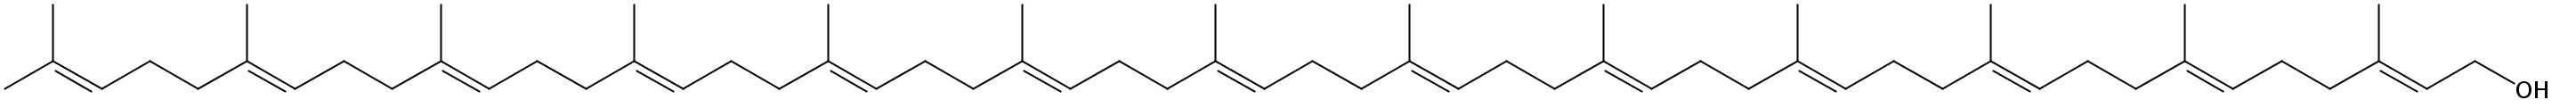 Structural formula of Tridecaprenol